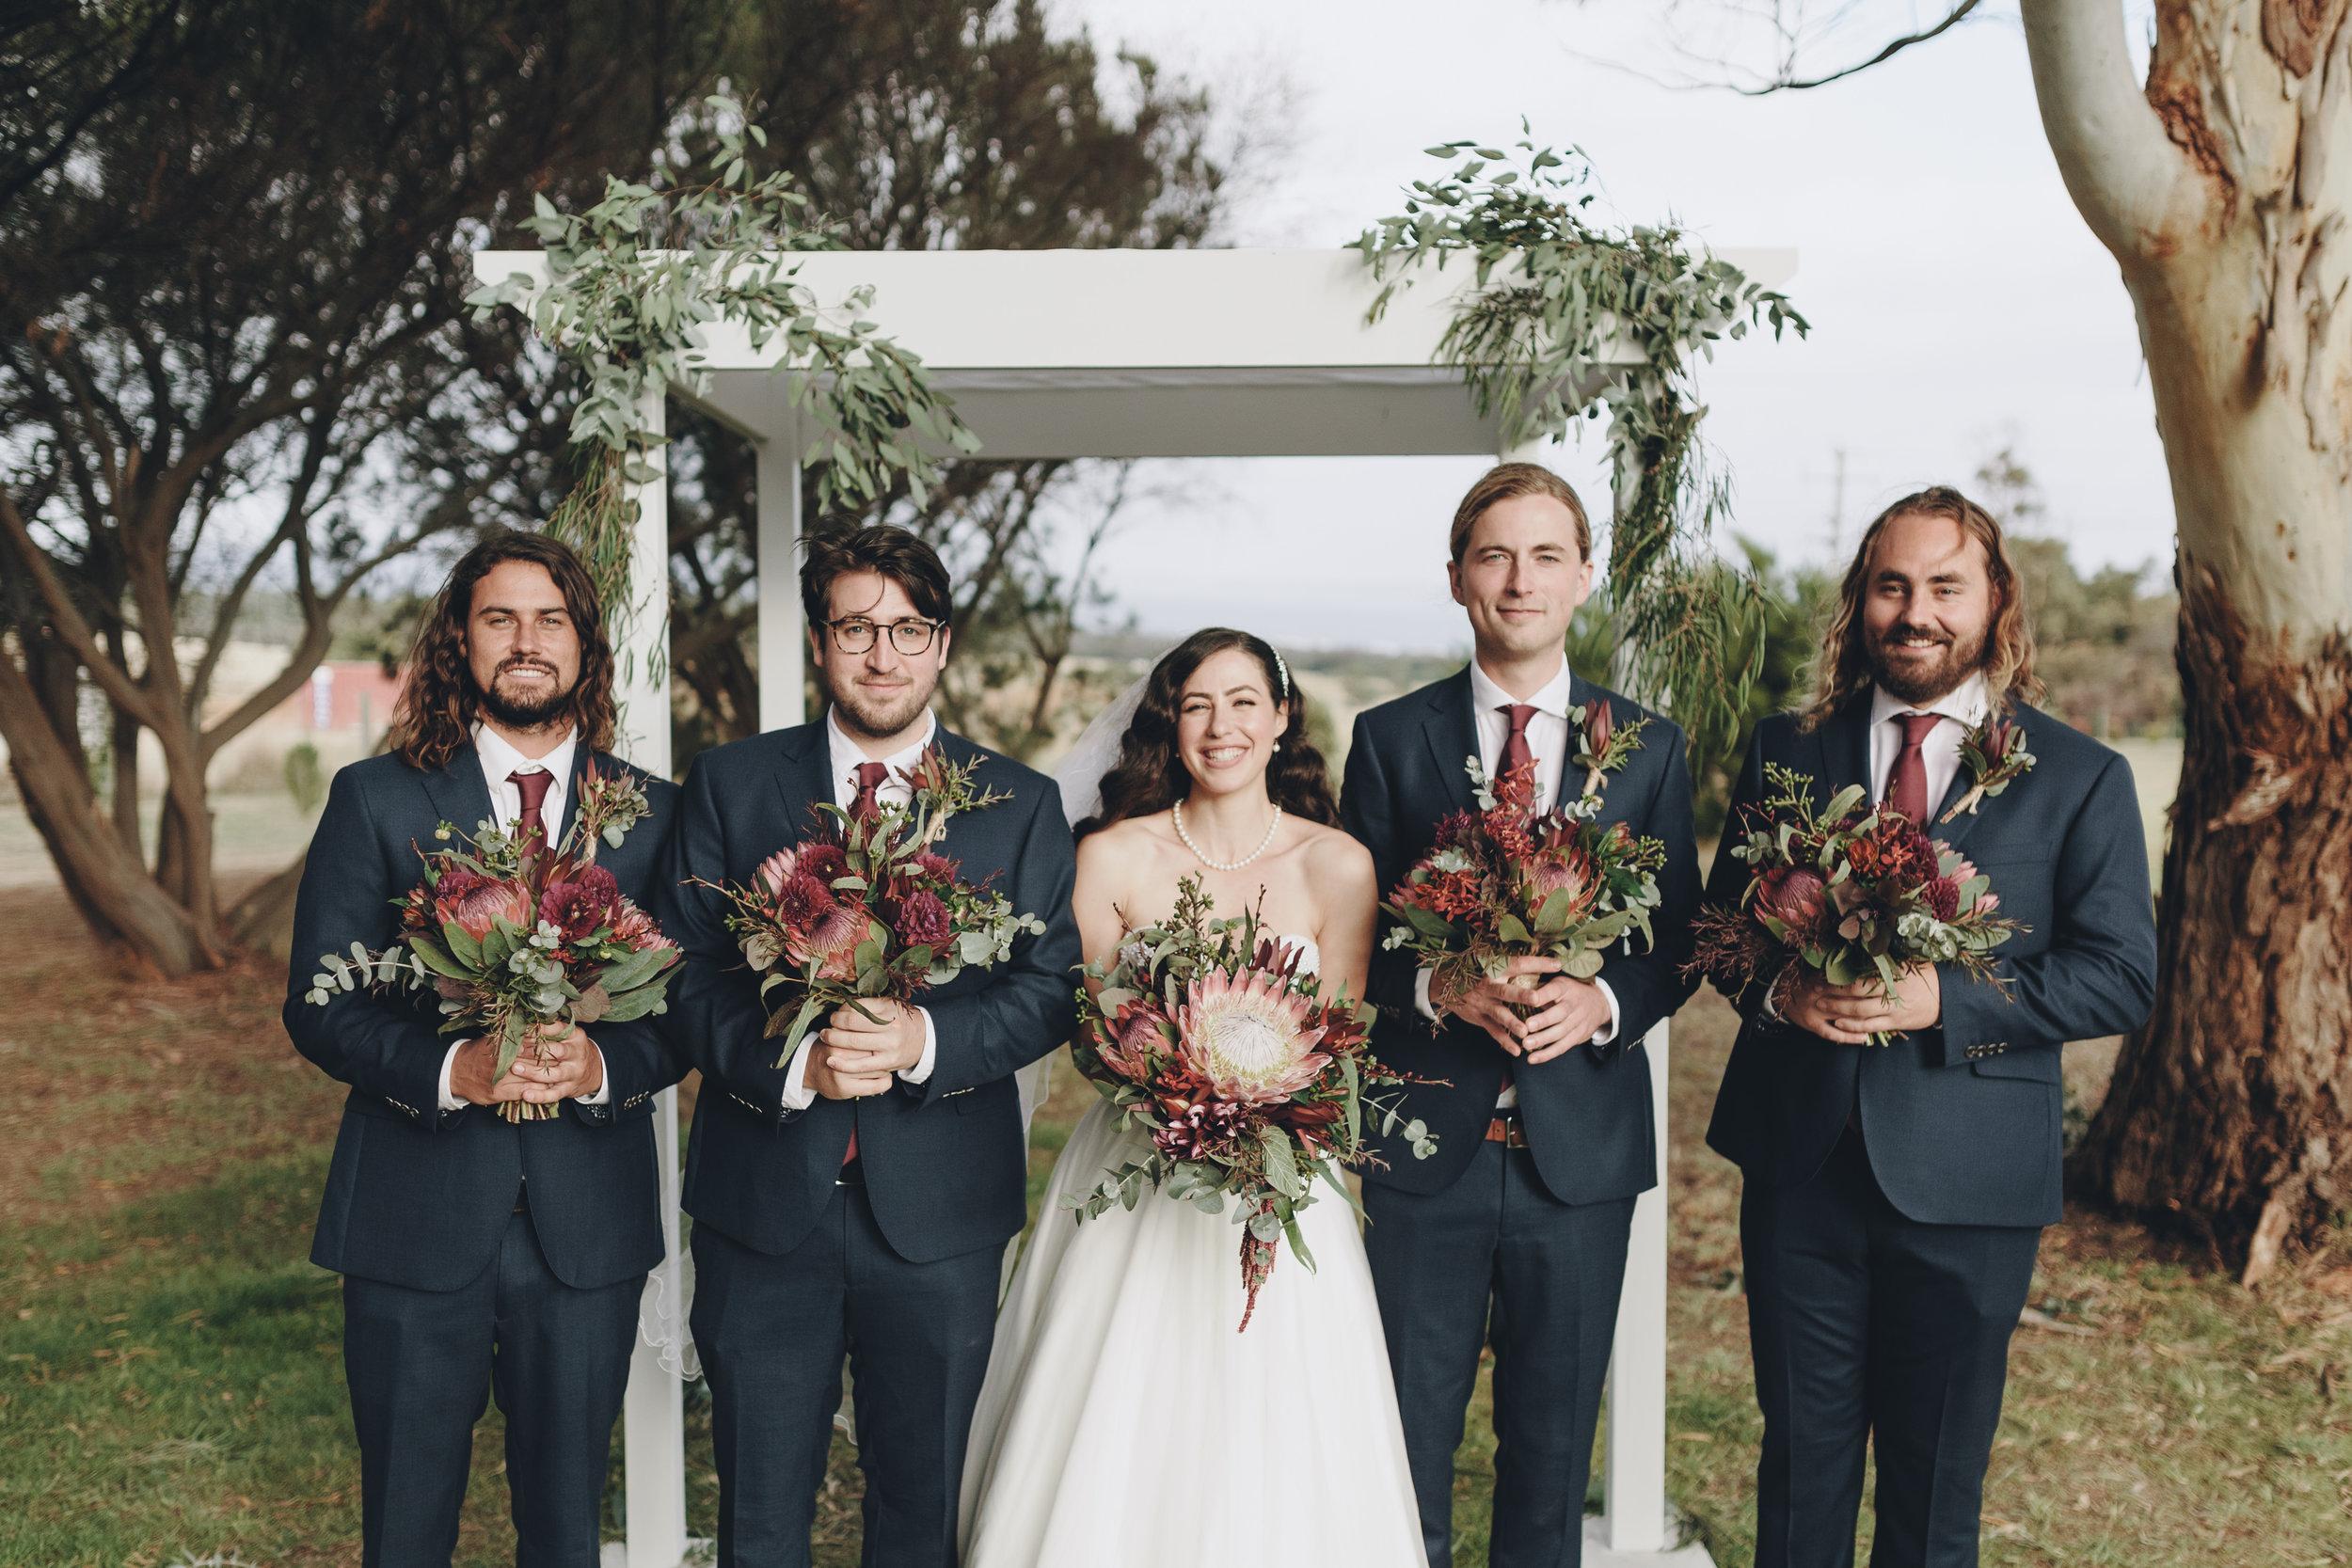 Wedding_Party-34.jpg